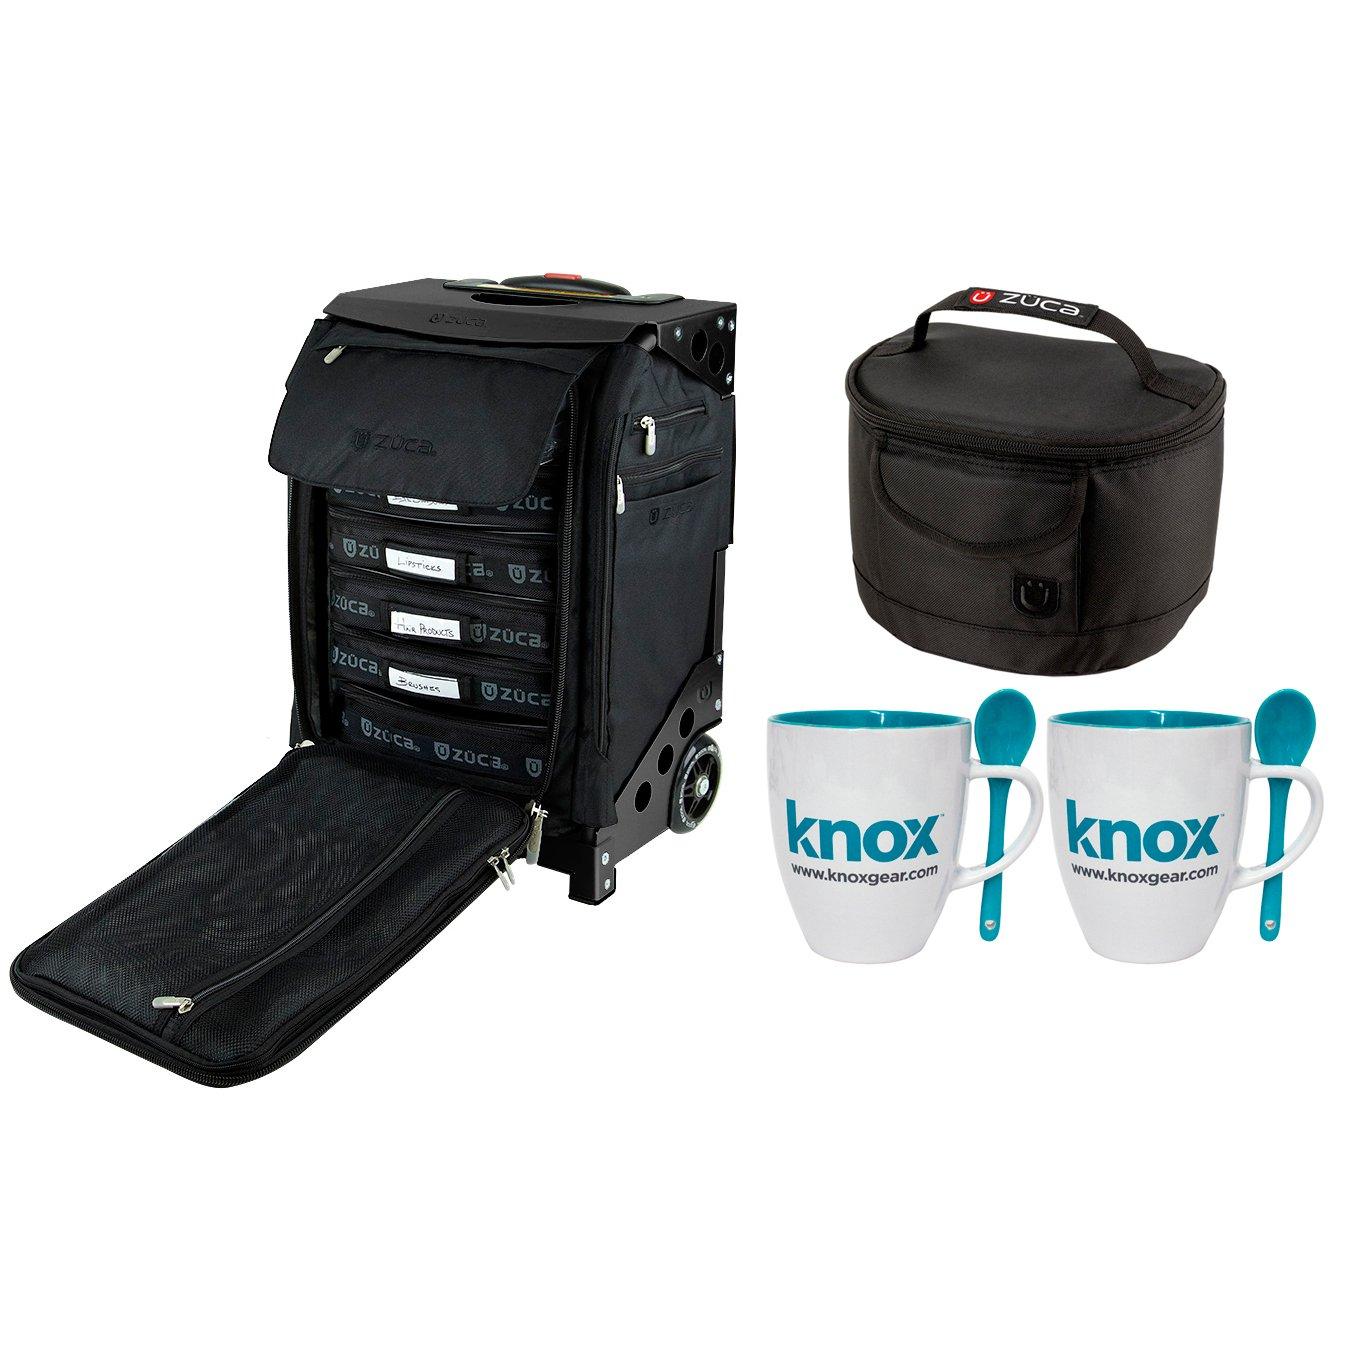 ZUCA Flyer Artist Bag & Frame w/Matching Lunchbox and 2 Knox Mugs (Black/Black)